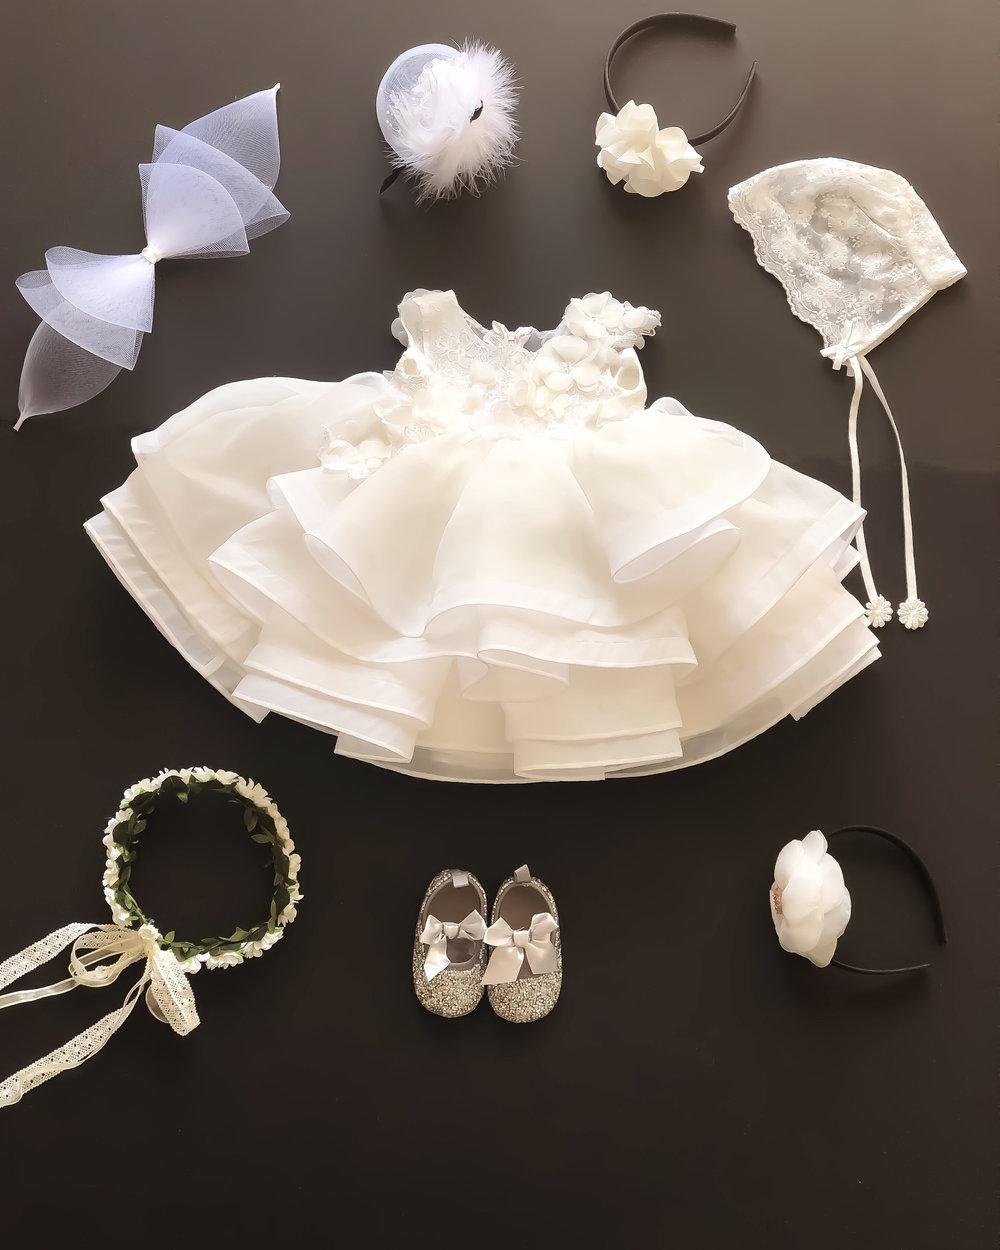 dress rental - Dresses will include matching accessories (randomly picked - lace hat, hair bands, shoes, etc.)각상품에 어울리는 3~5가지 악세사리(화관, 머리띠, 레이스 모자, 신발, 머리핀 등등)로 풀대여 구성으로 보내드립니다.